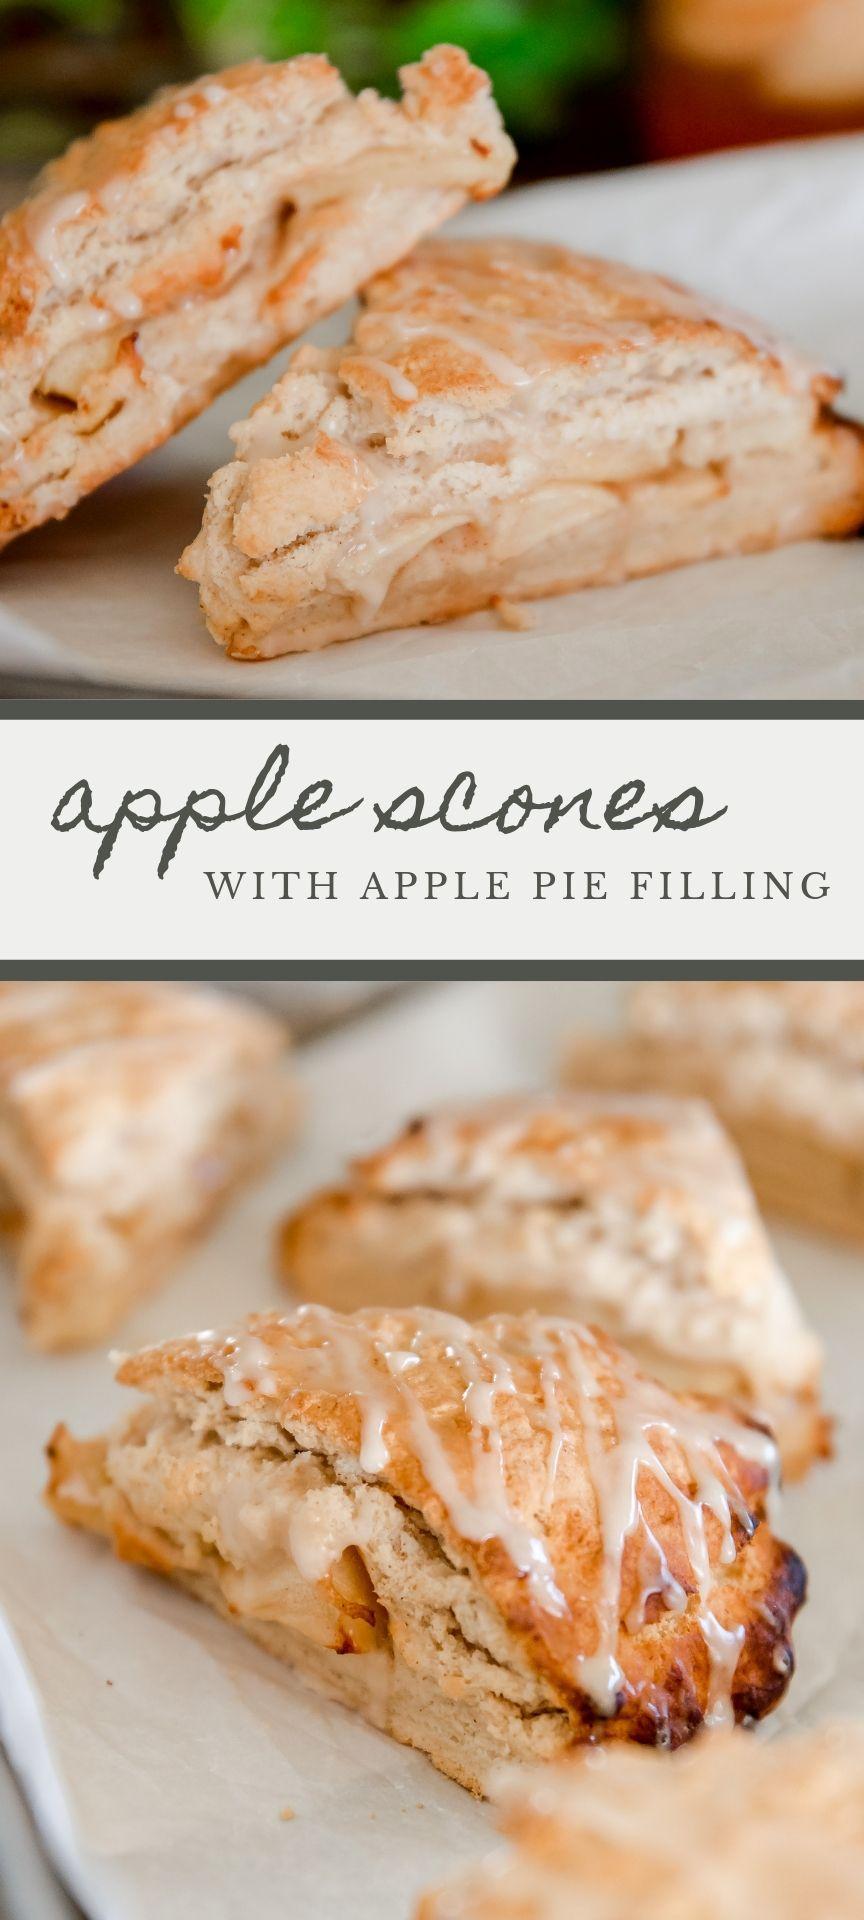 Yummy apple dessert recipe idea: apple scones with apple pie filling and cinnamon glaze! #applerecipes #applescones #appledesserts